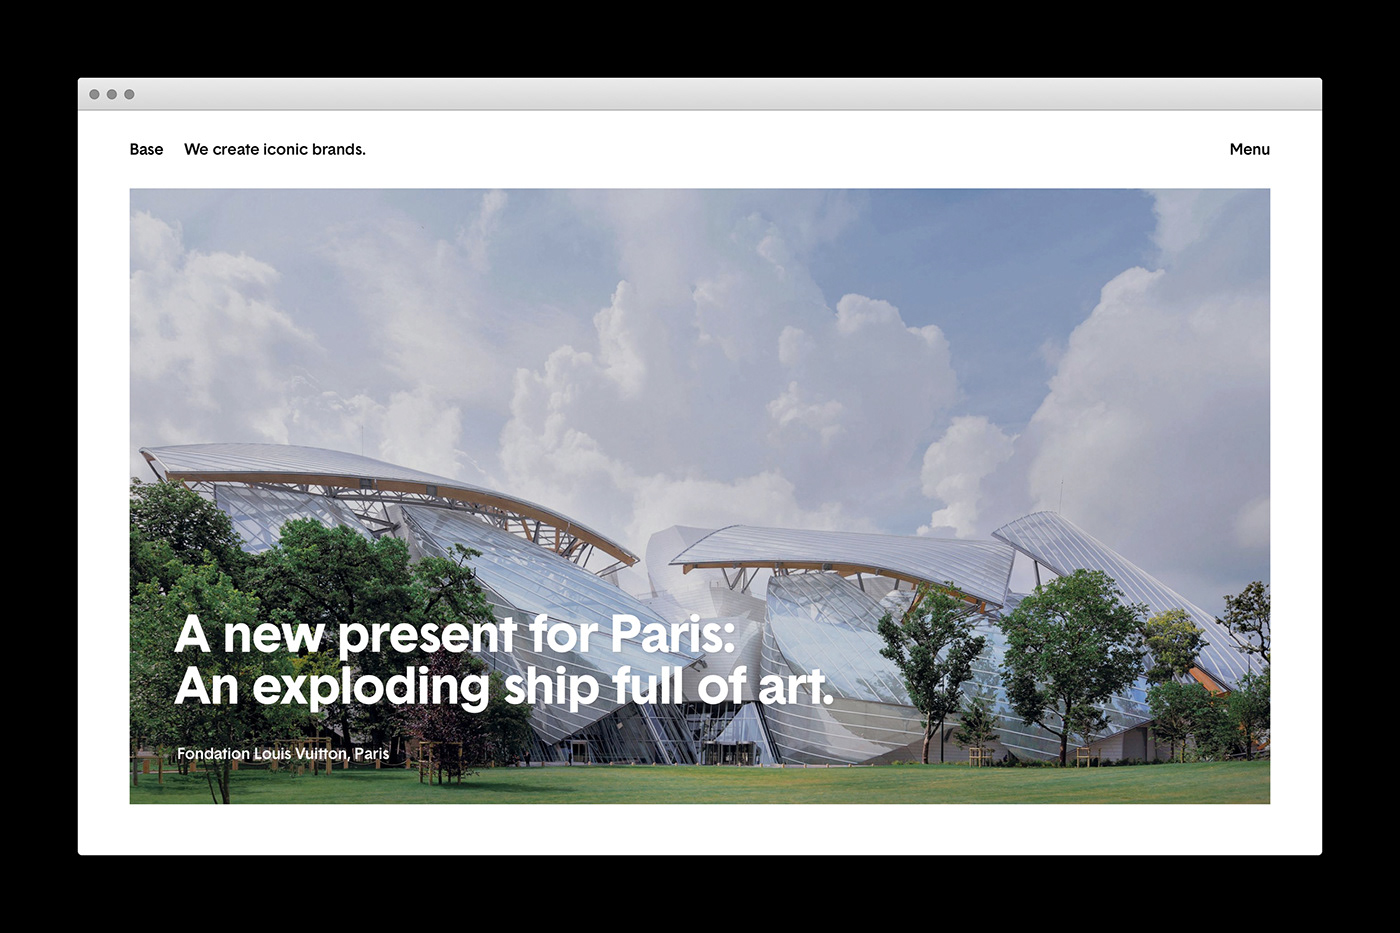 Minimalist Web Design Inspiration: Base Studios